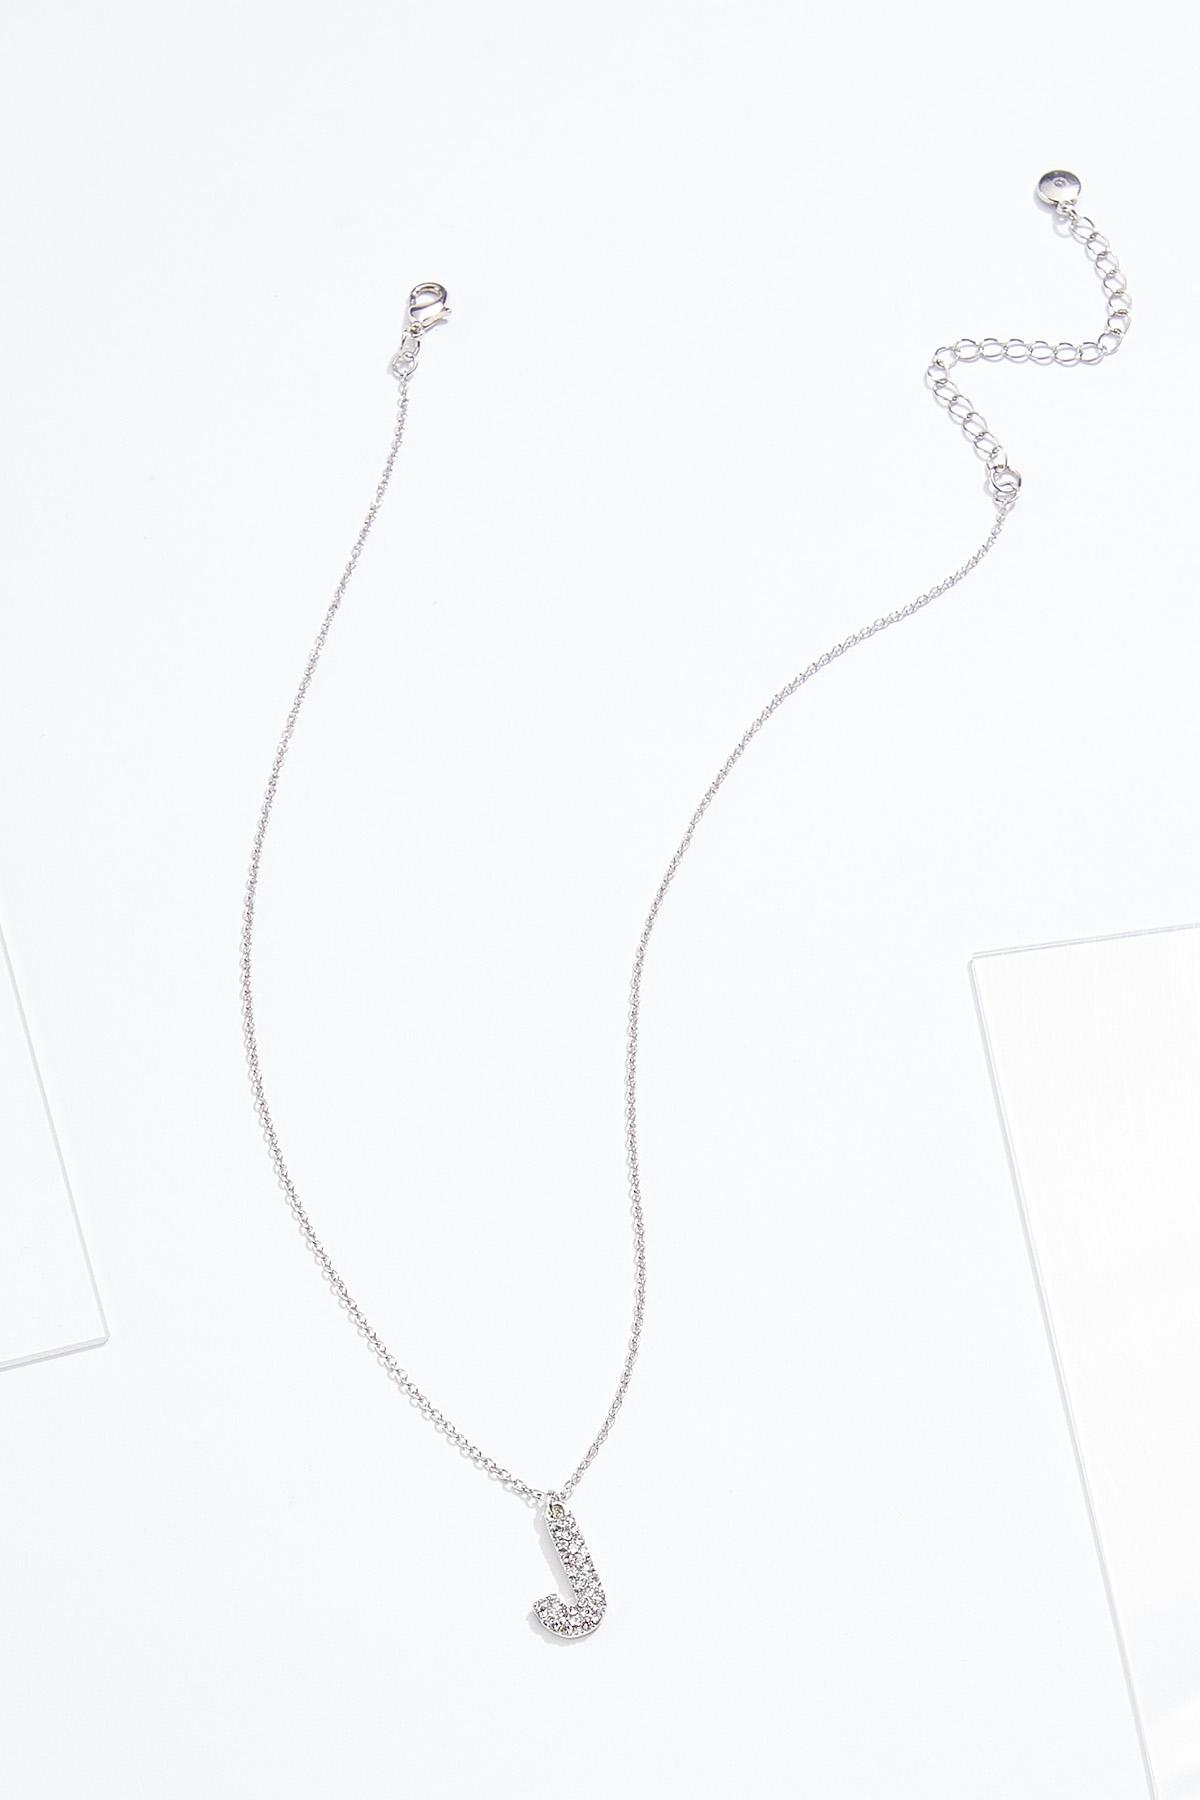 Rhinestone J Pendant Necklace